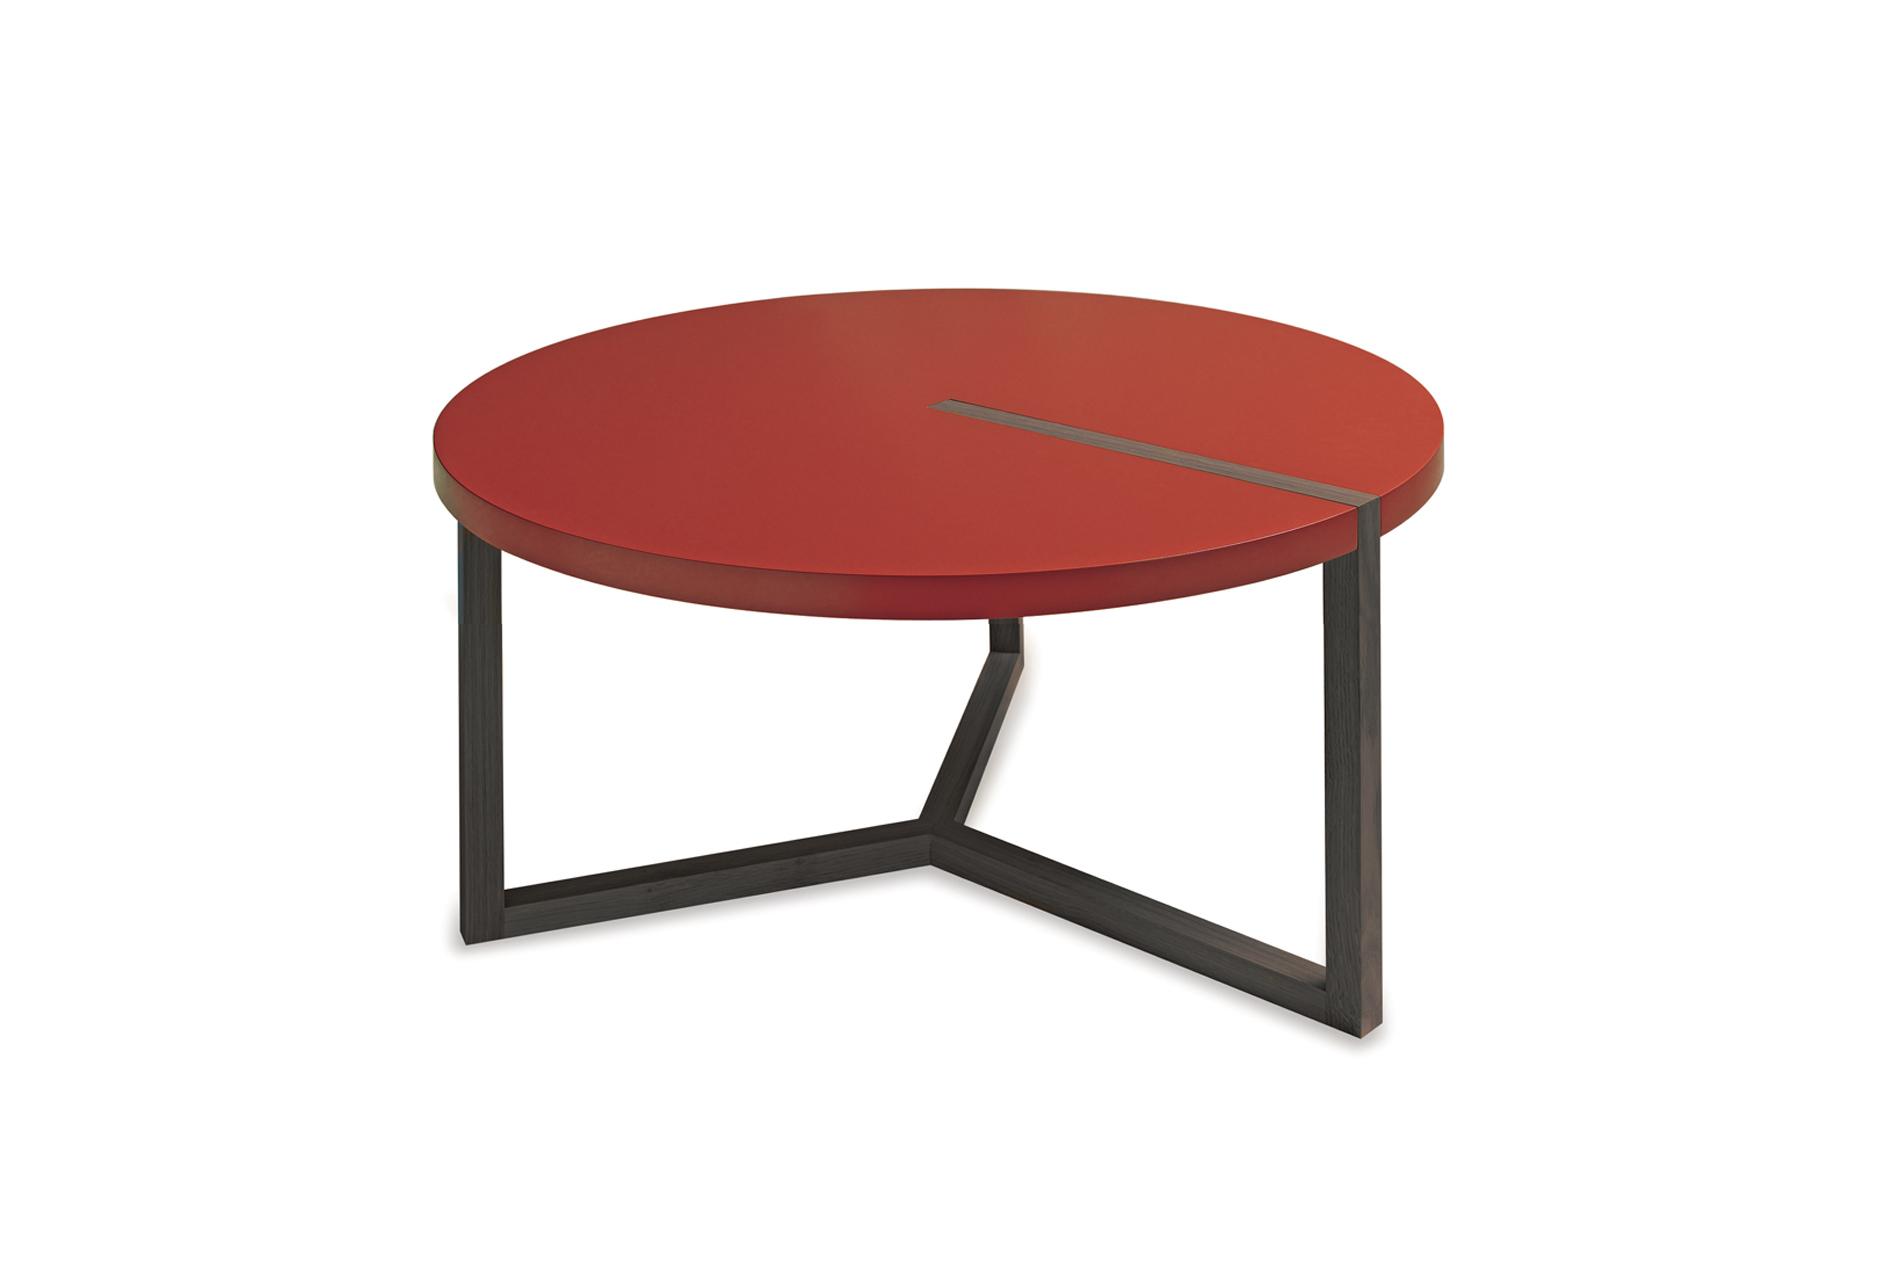 Tables Basses Triolet First Time Selection Charme Du Logis